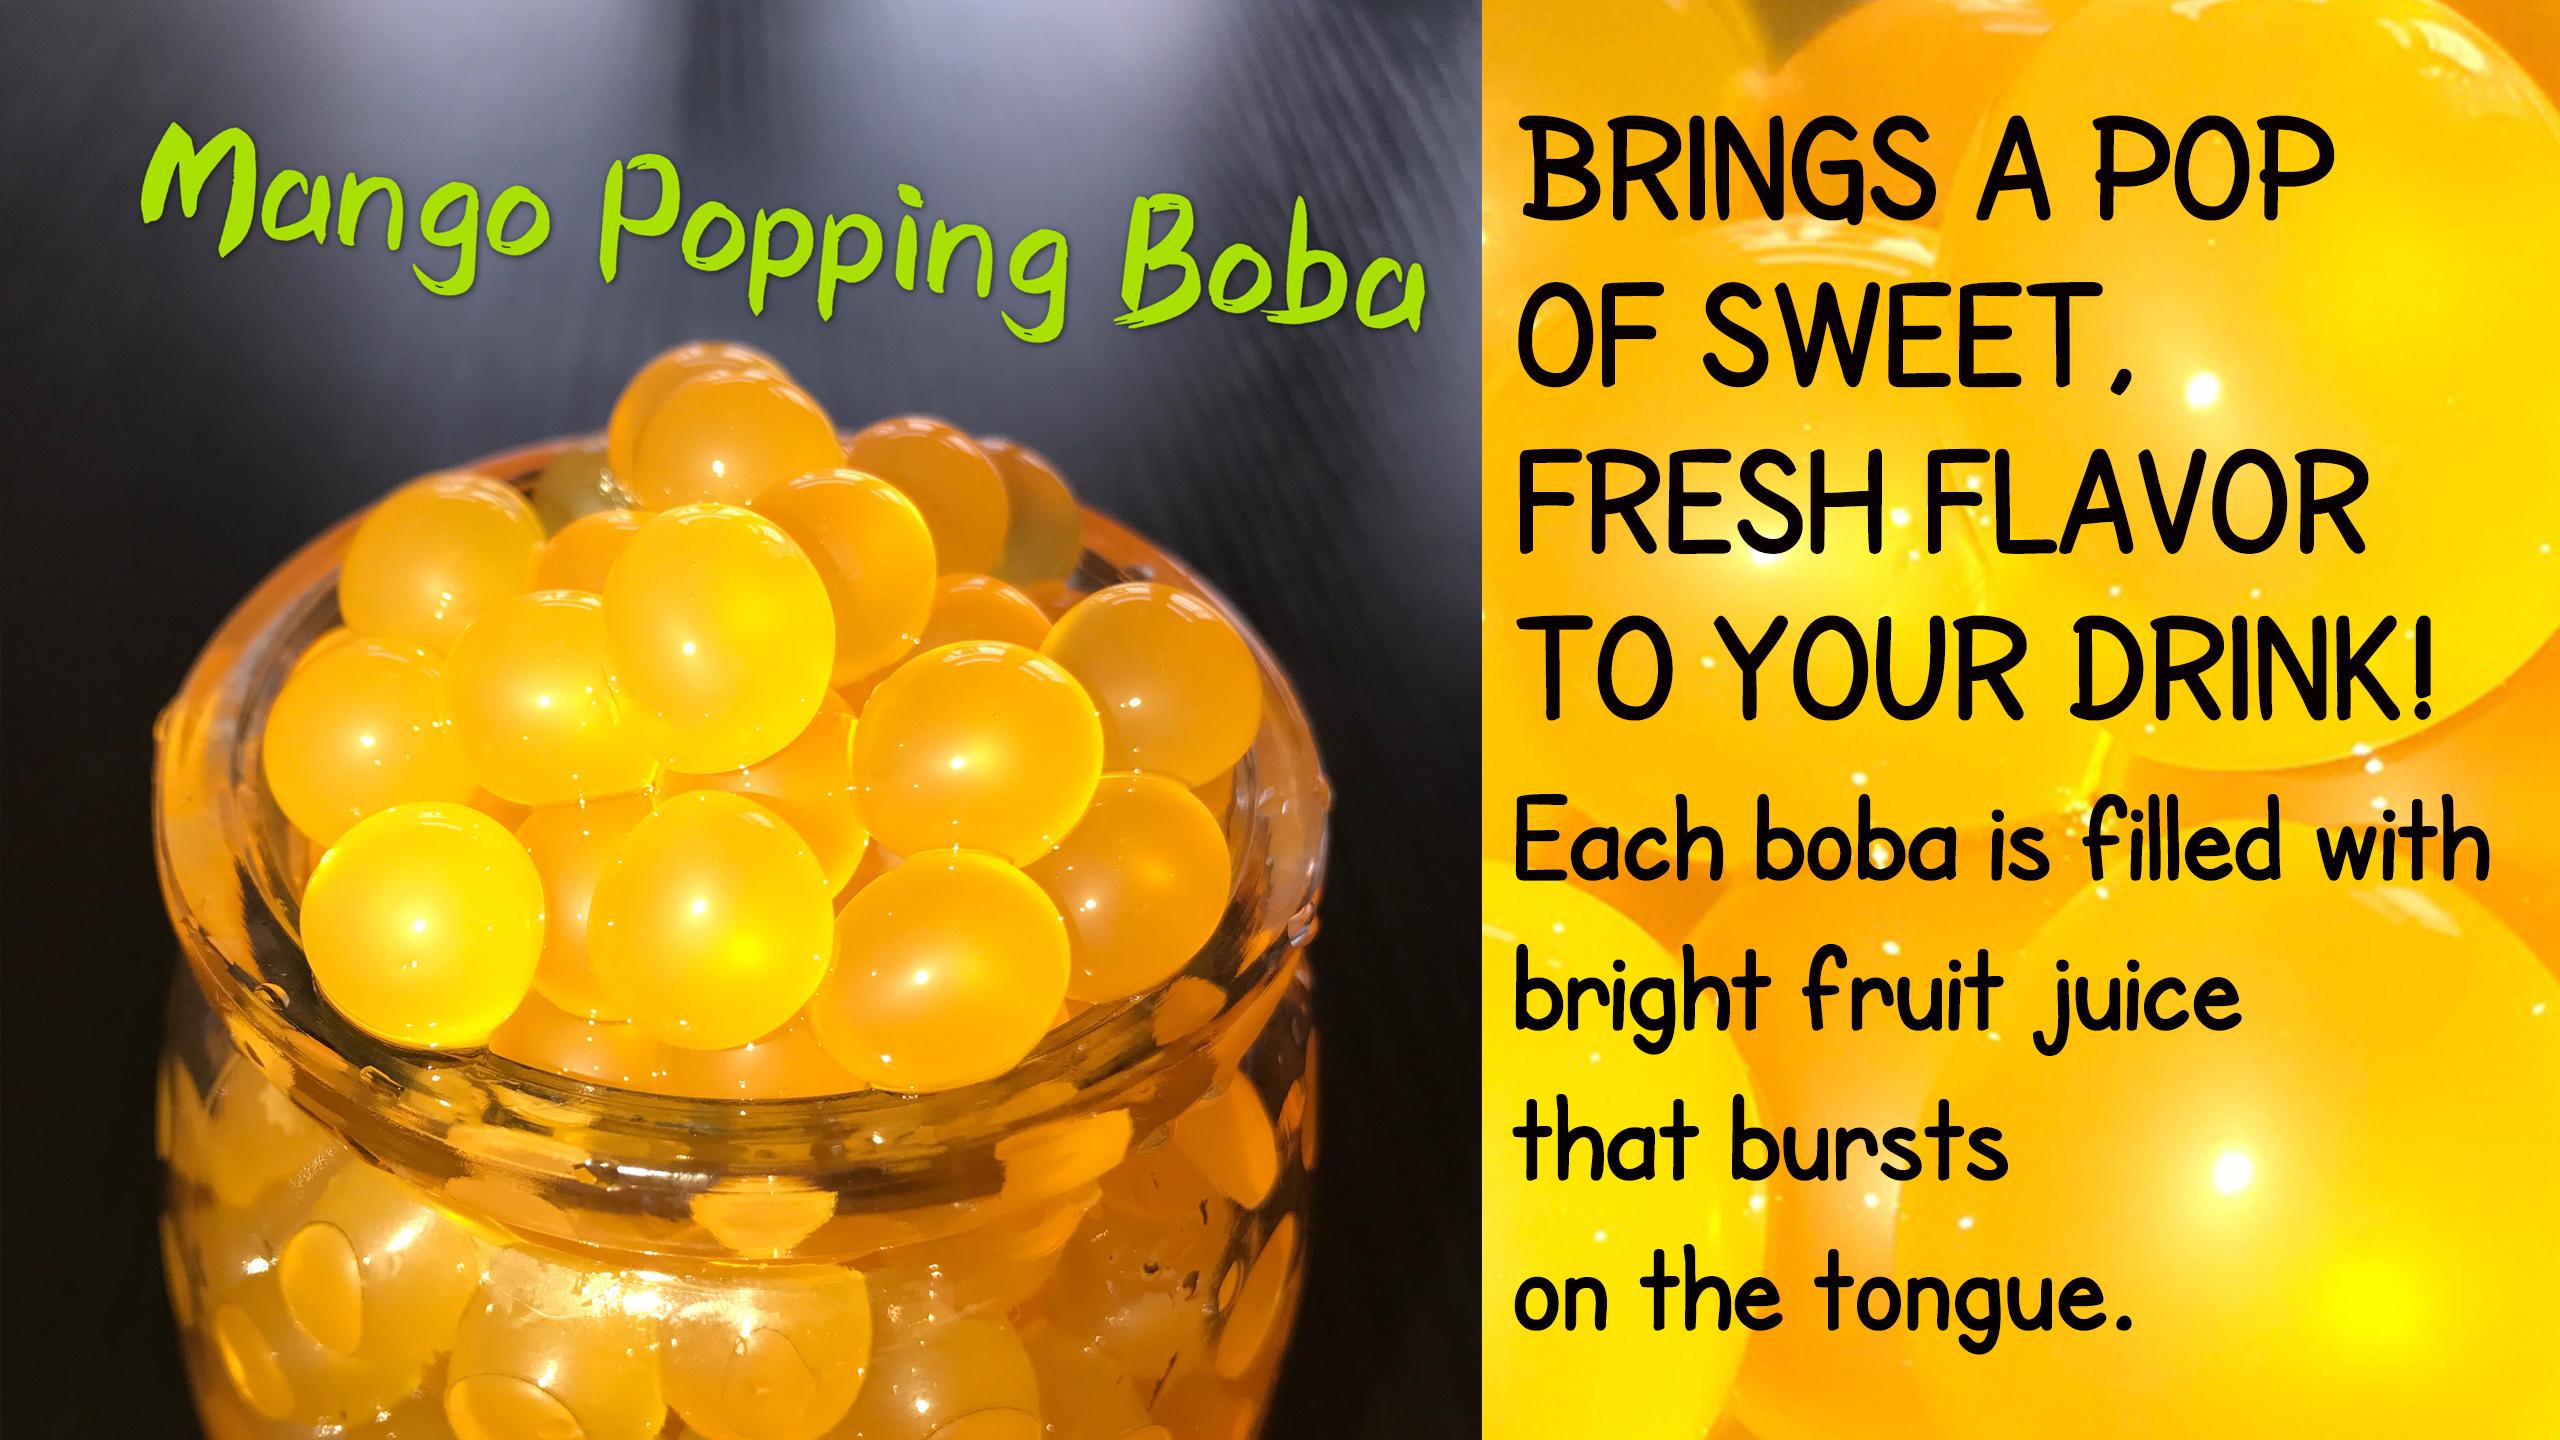 mango popping